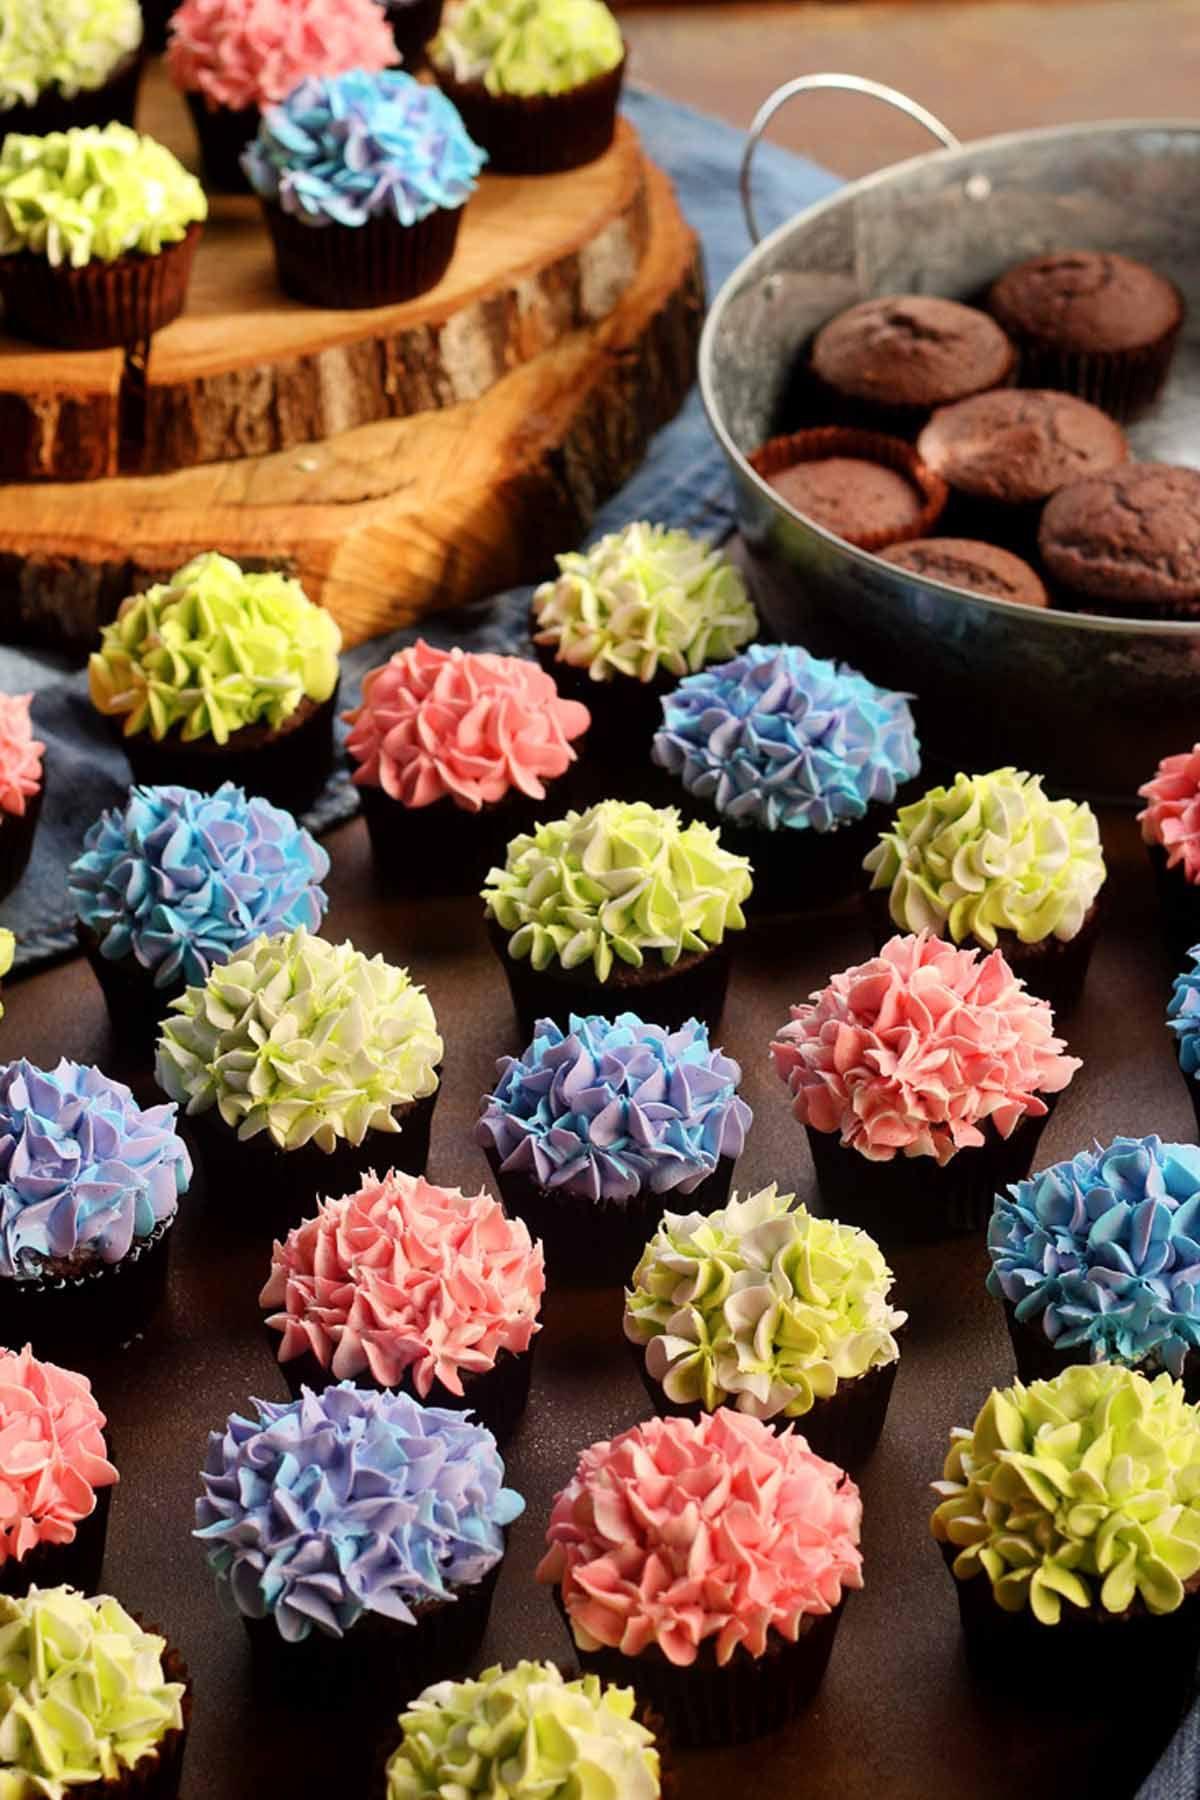 cupcake recipe & 30 Best Cupcake Decorating Ideas - Easy Recipes for Homemade Cupcakes